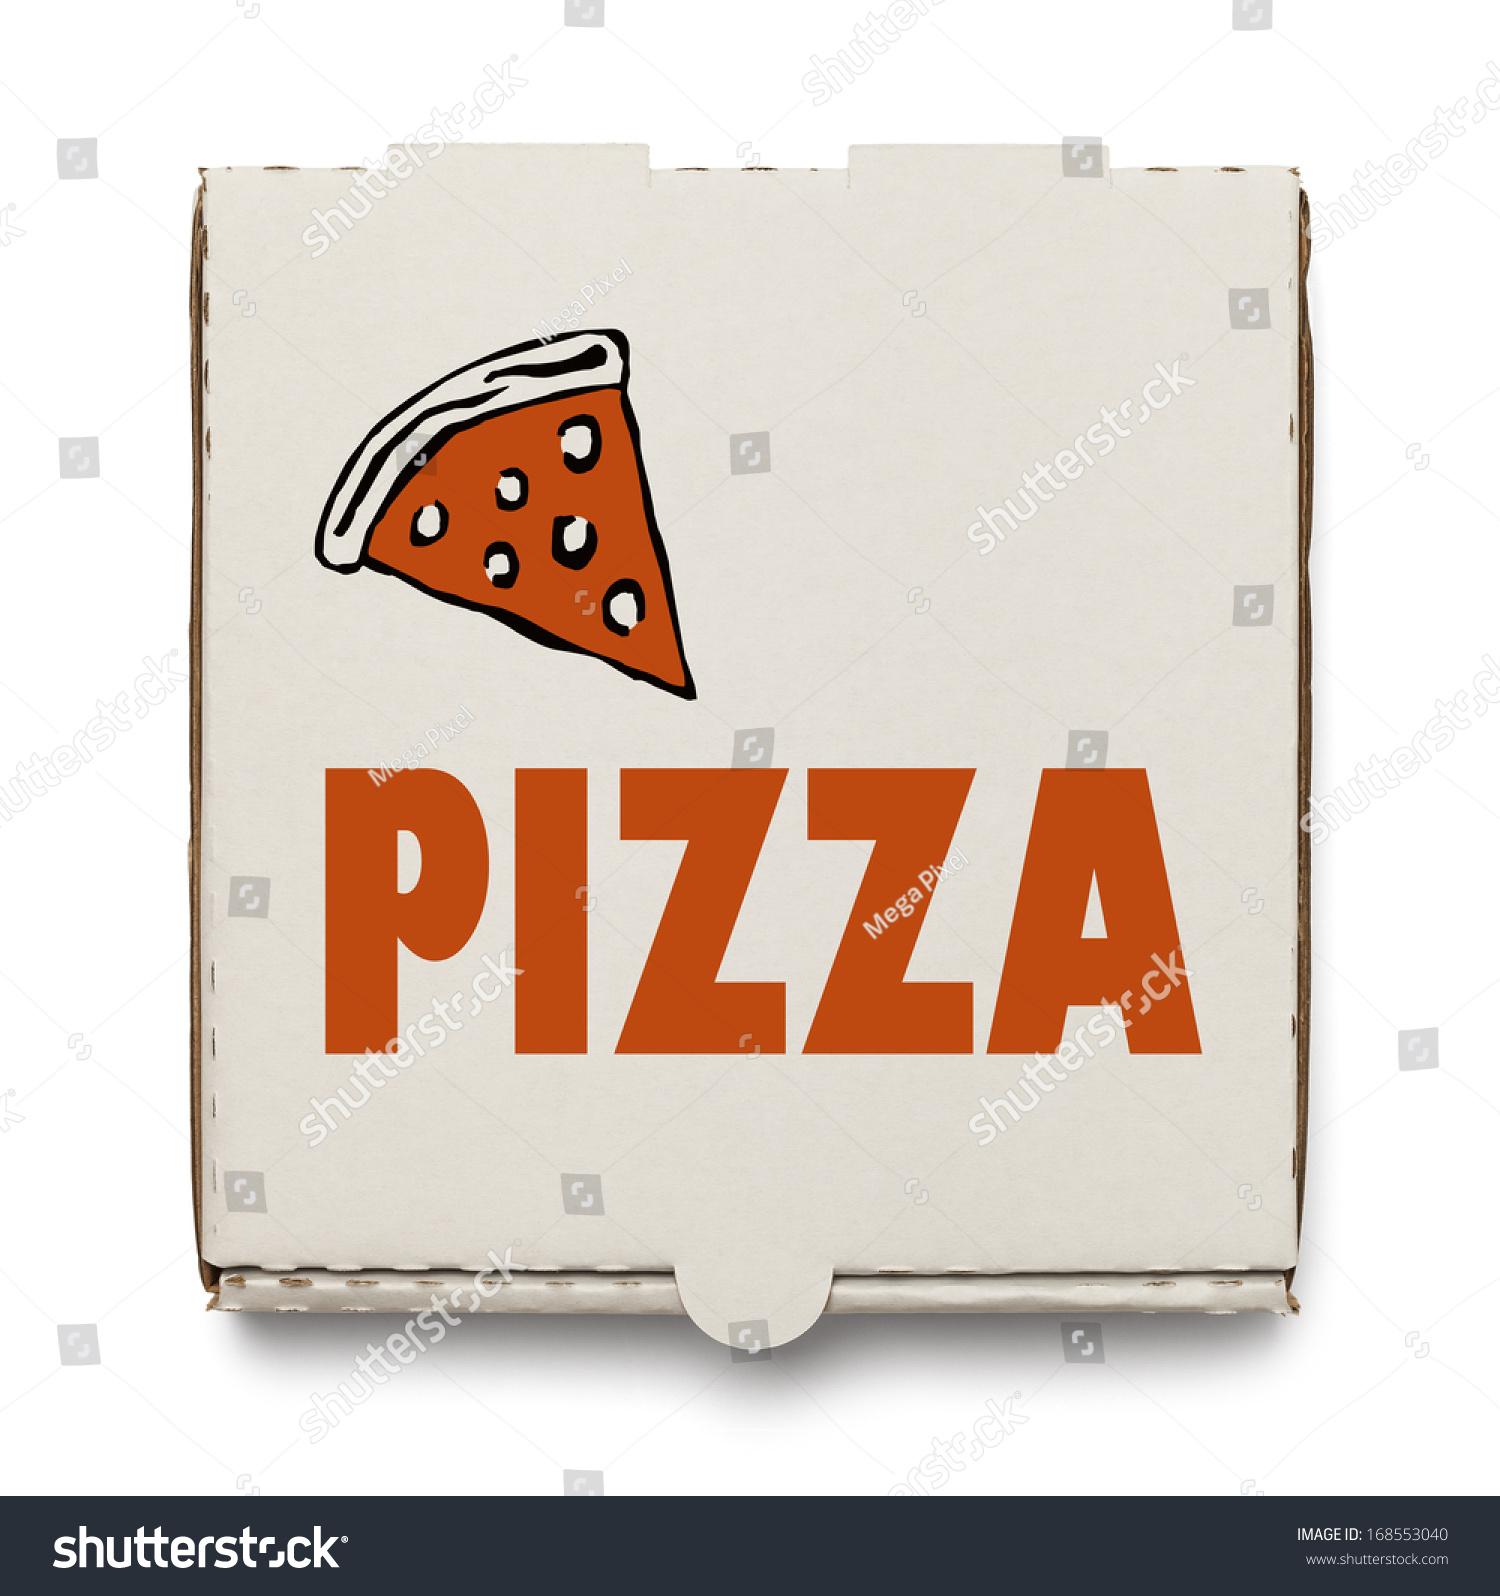 pizza box clipart free - photo #11